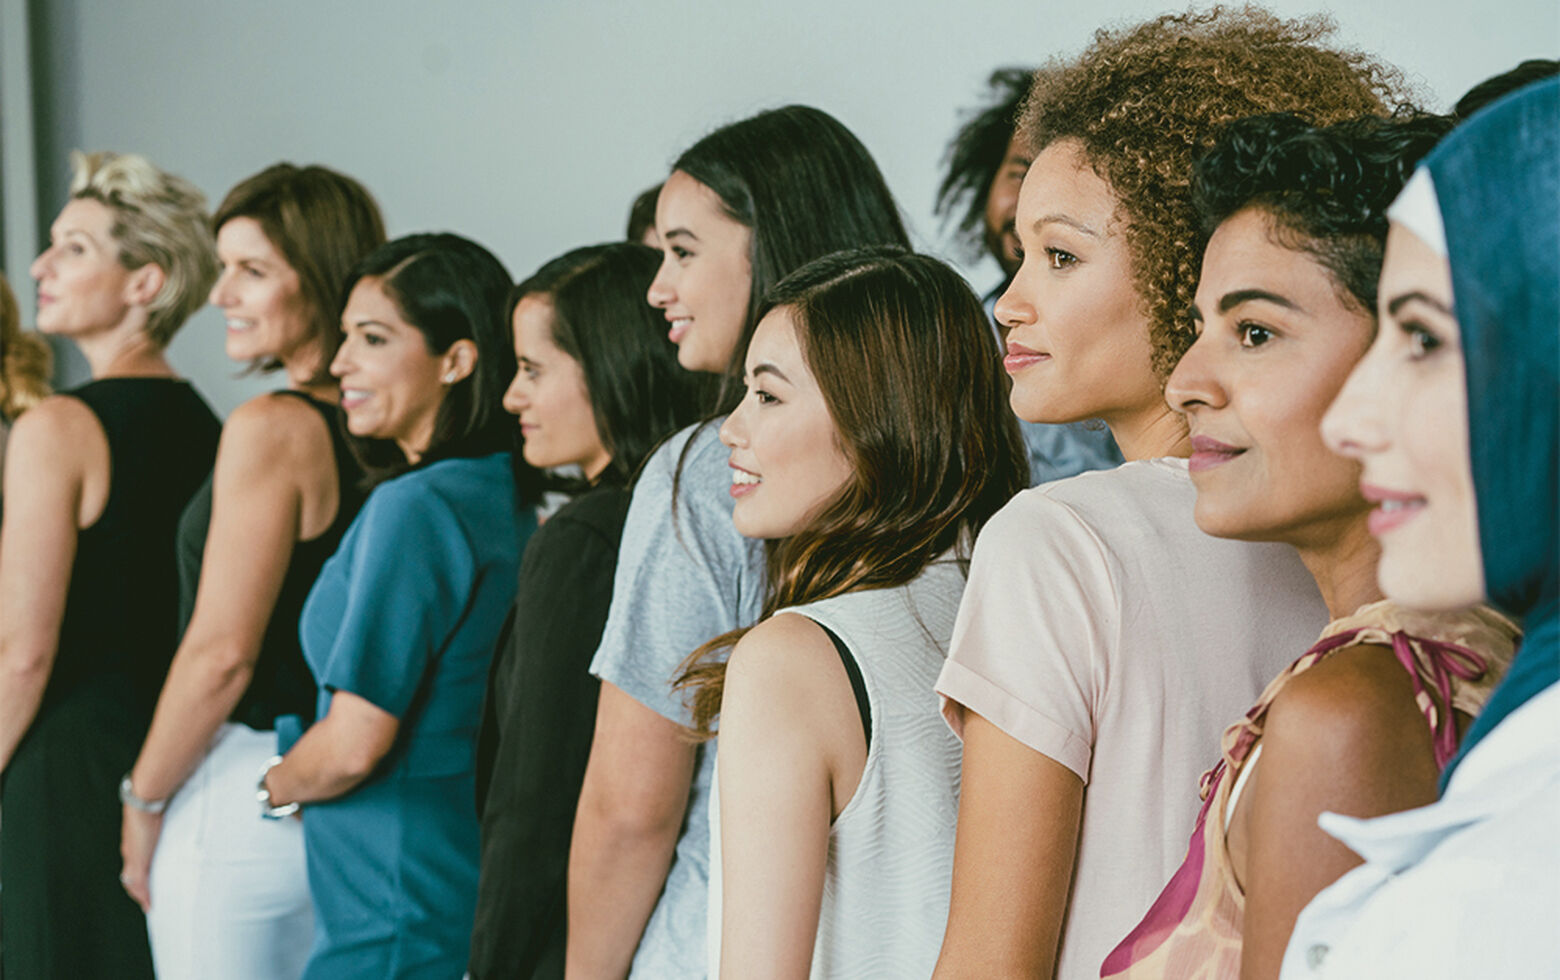 Cgre women group